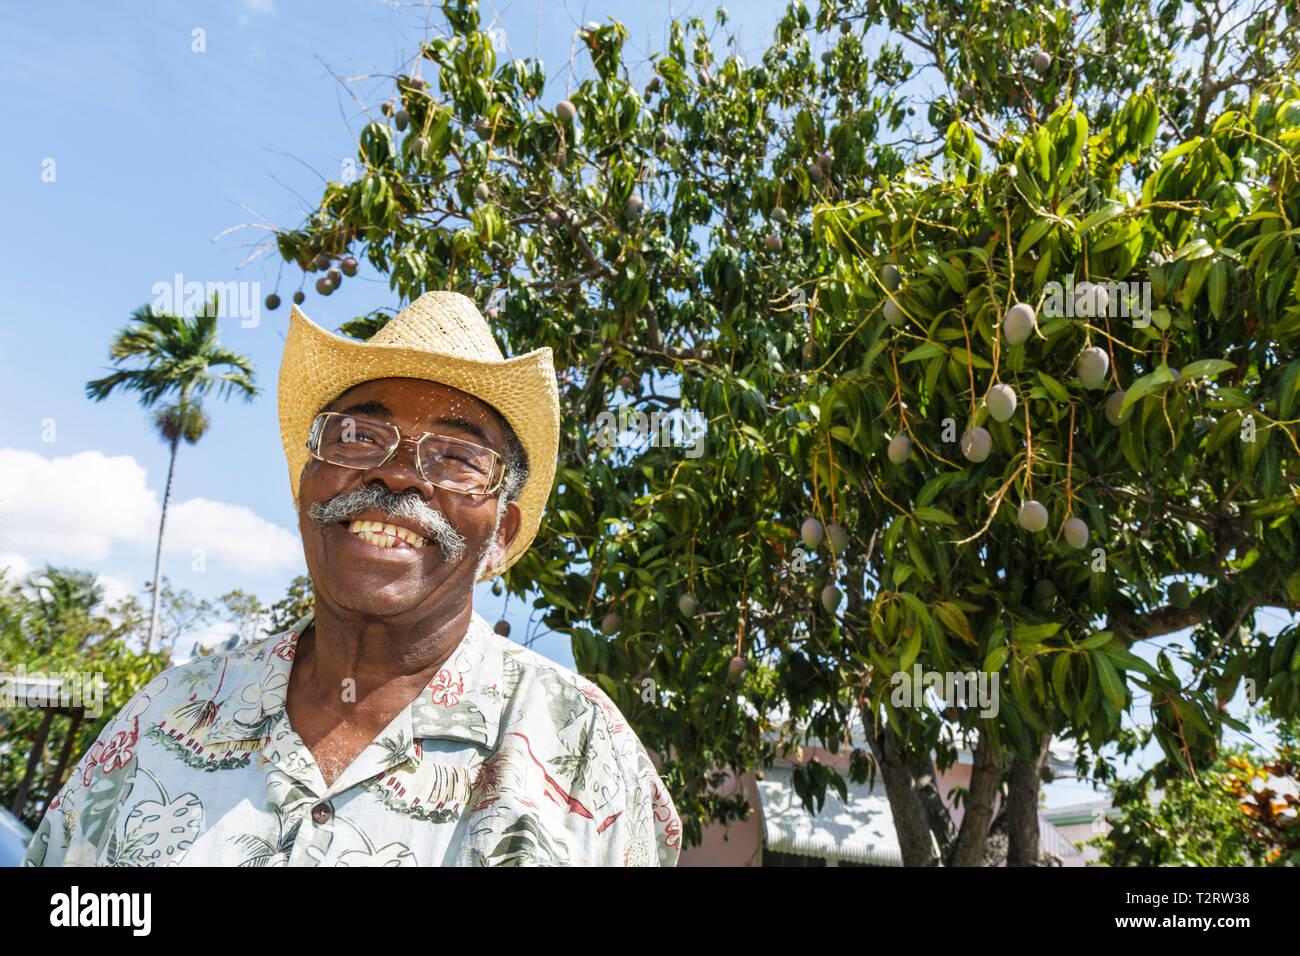 Miami Coconut Grove Florida Black Mann Mango Südfrucht Baum Strohhut lächelnd Schnurrbart senior Stockbild